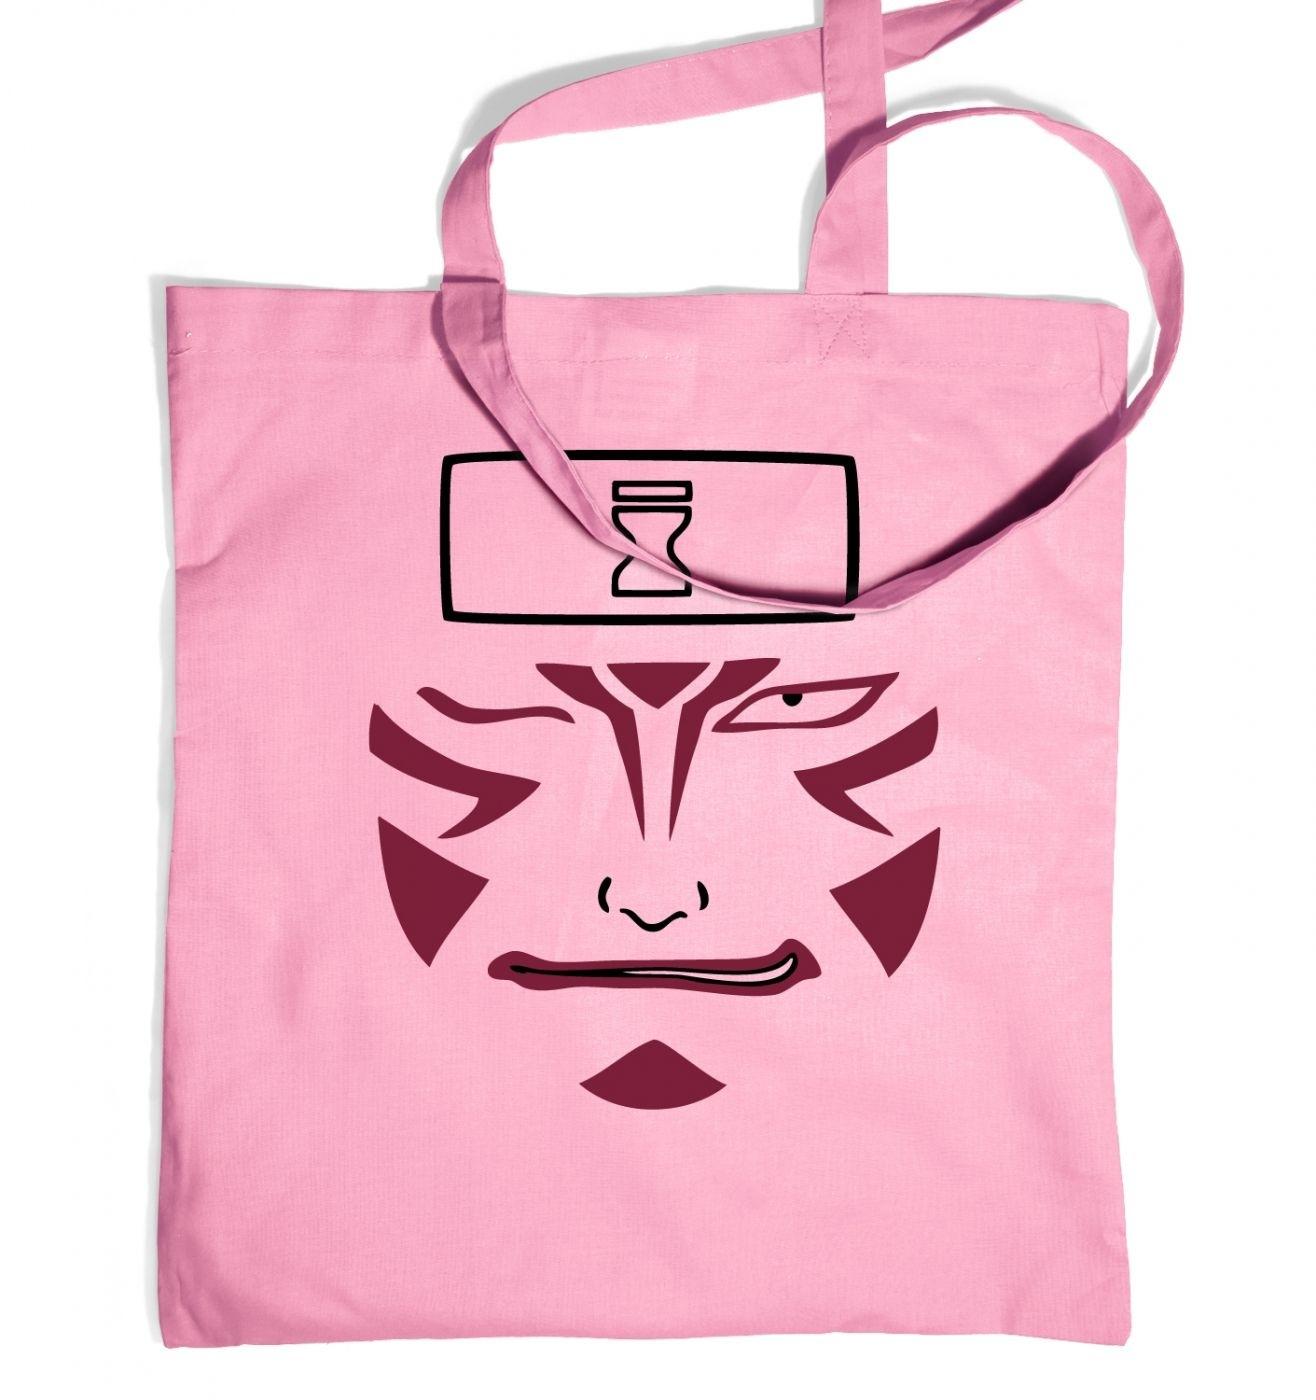 Kankuro Face - Tote Bag